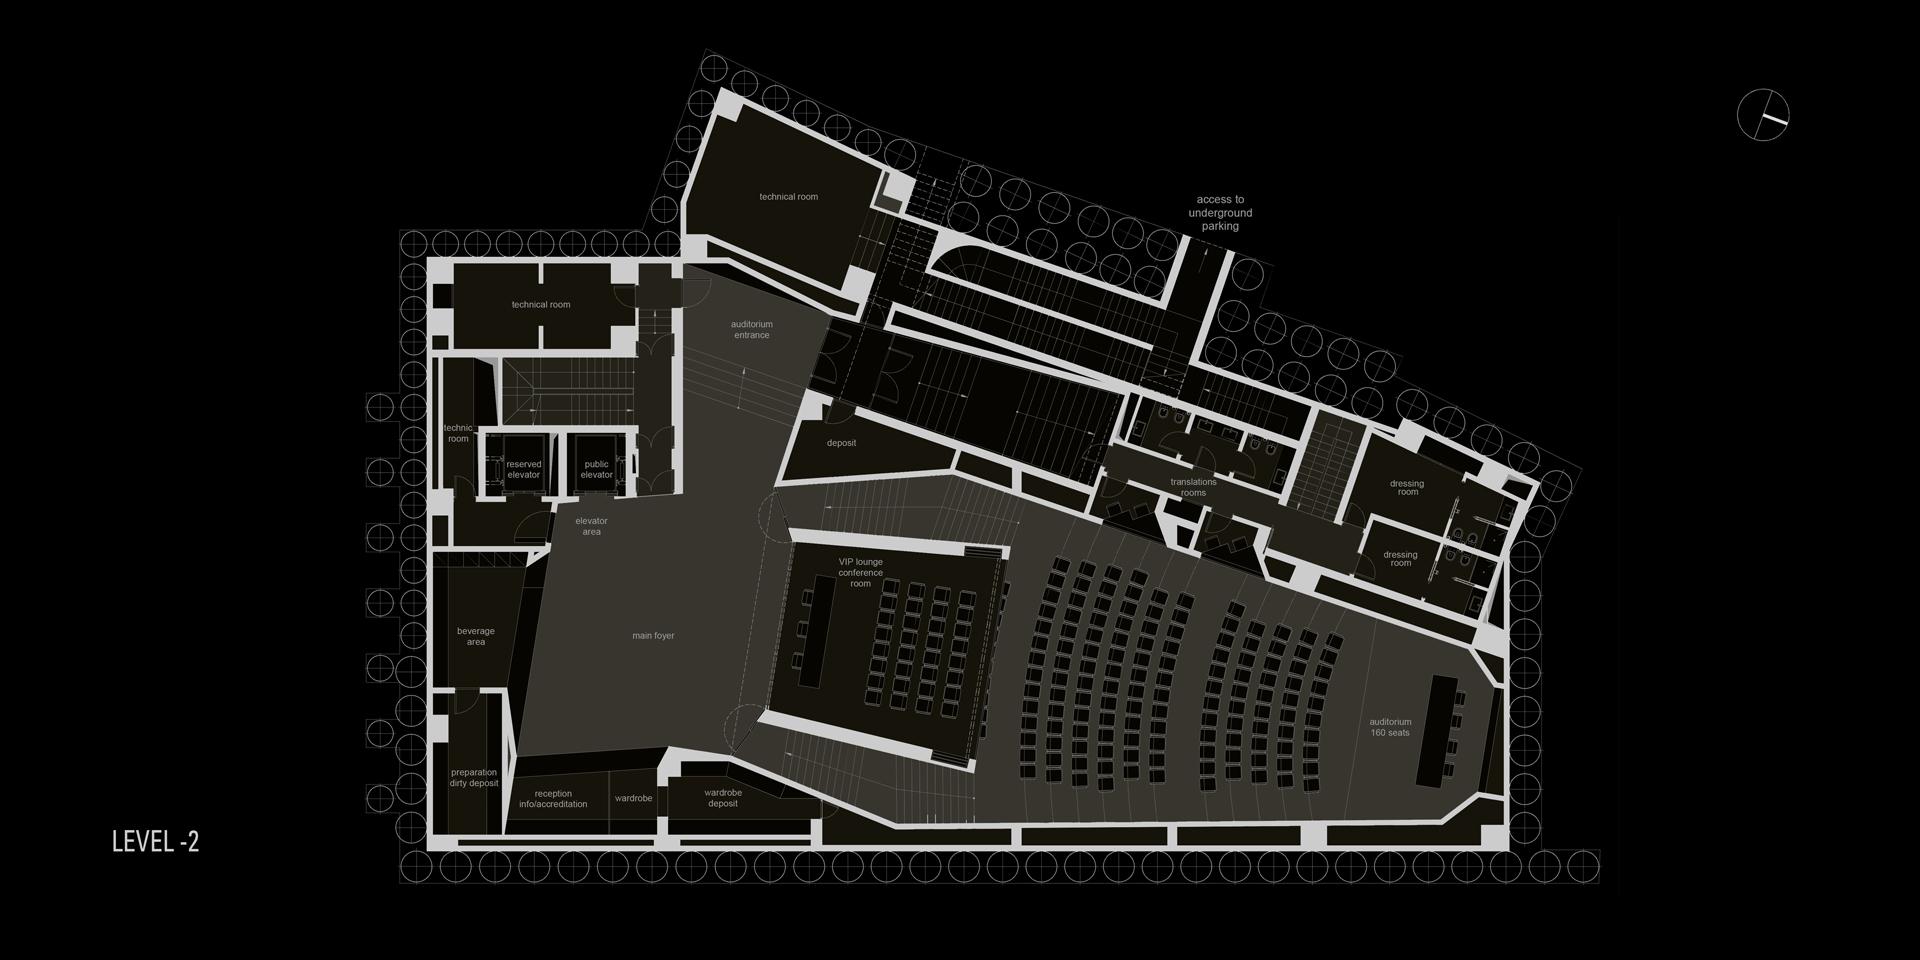 archinow_ADT_auditorium-asset-bank-02